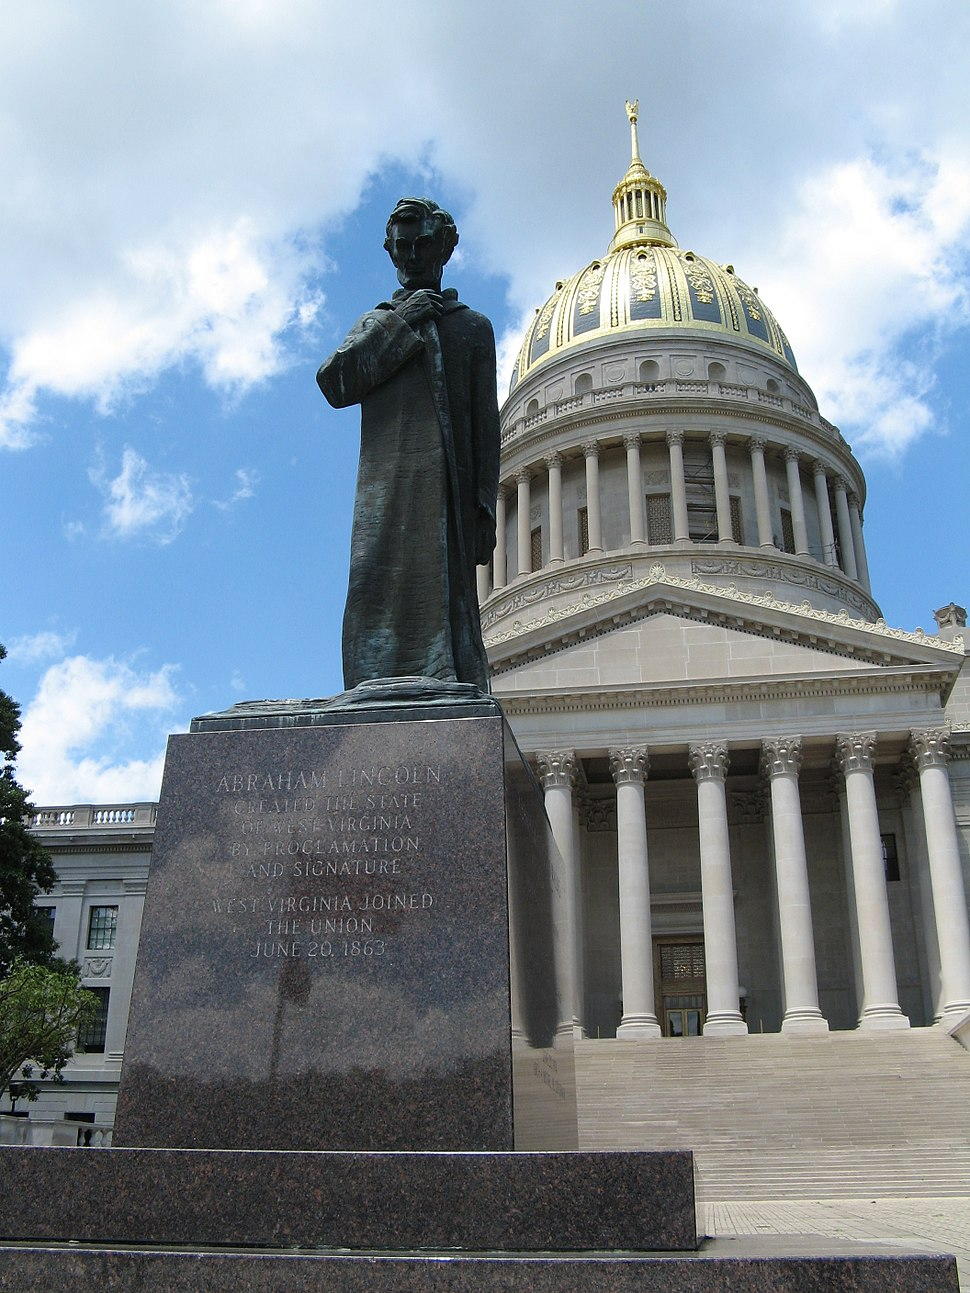 Abraham Lincoln - WV Statue